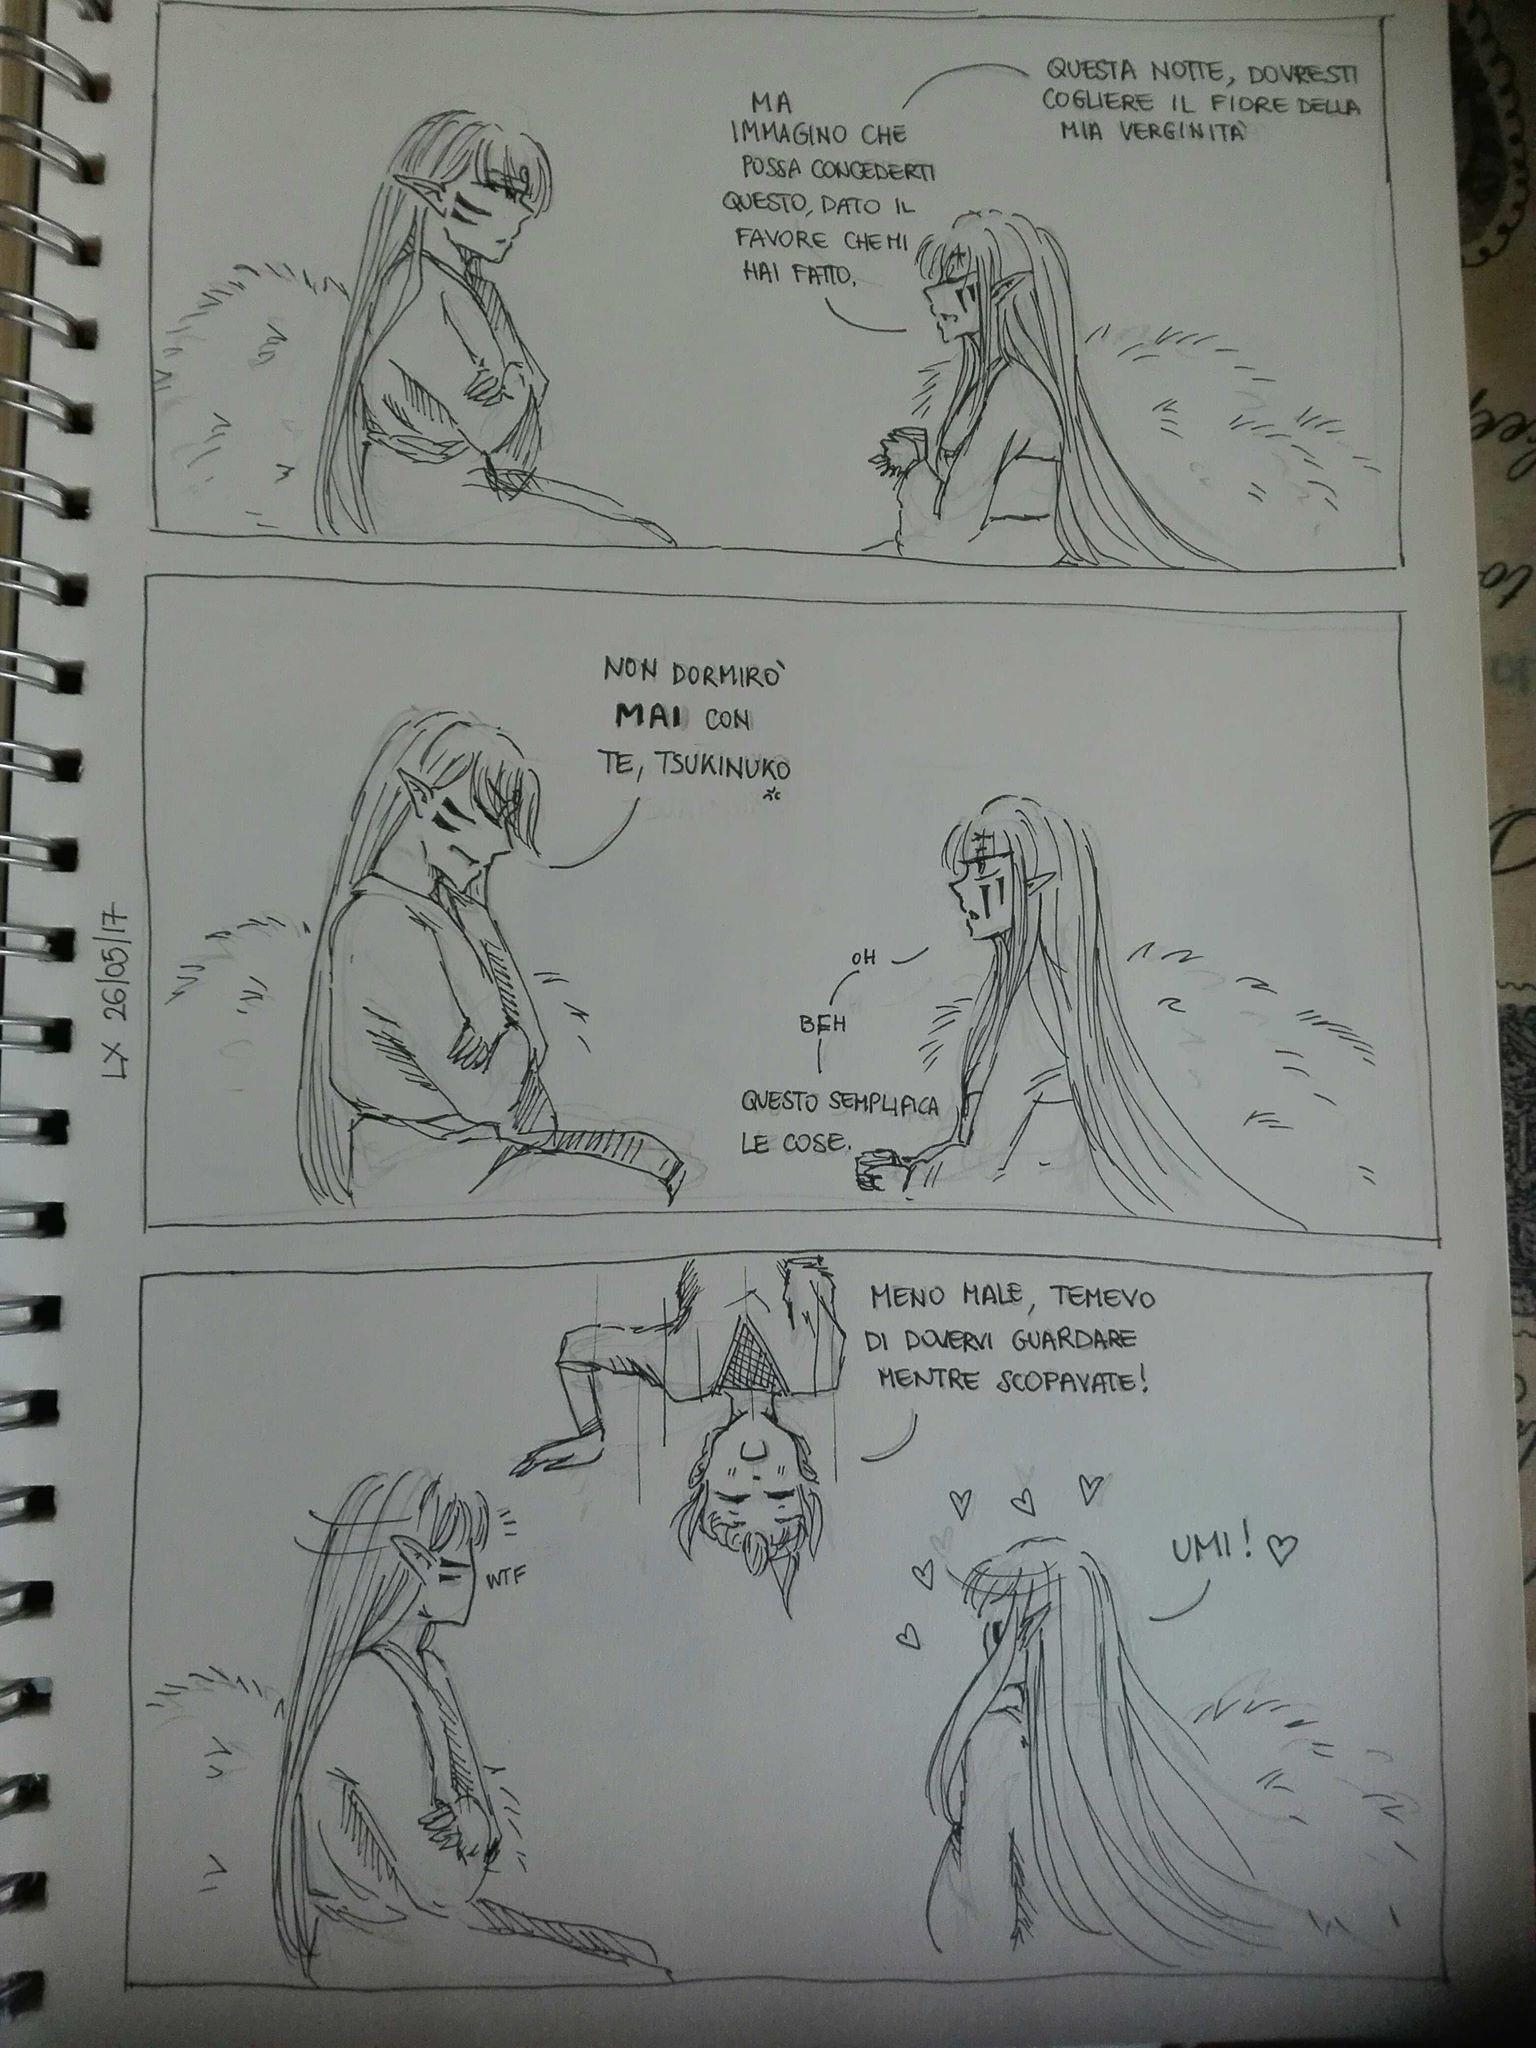 Vignetta deficiente #2 by Larcheex-Clicexia